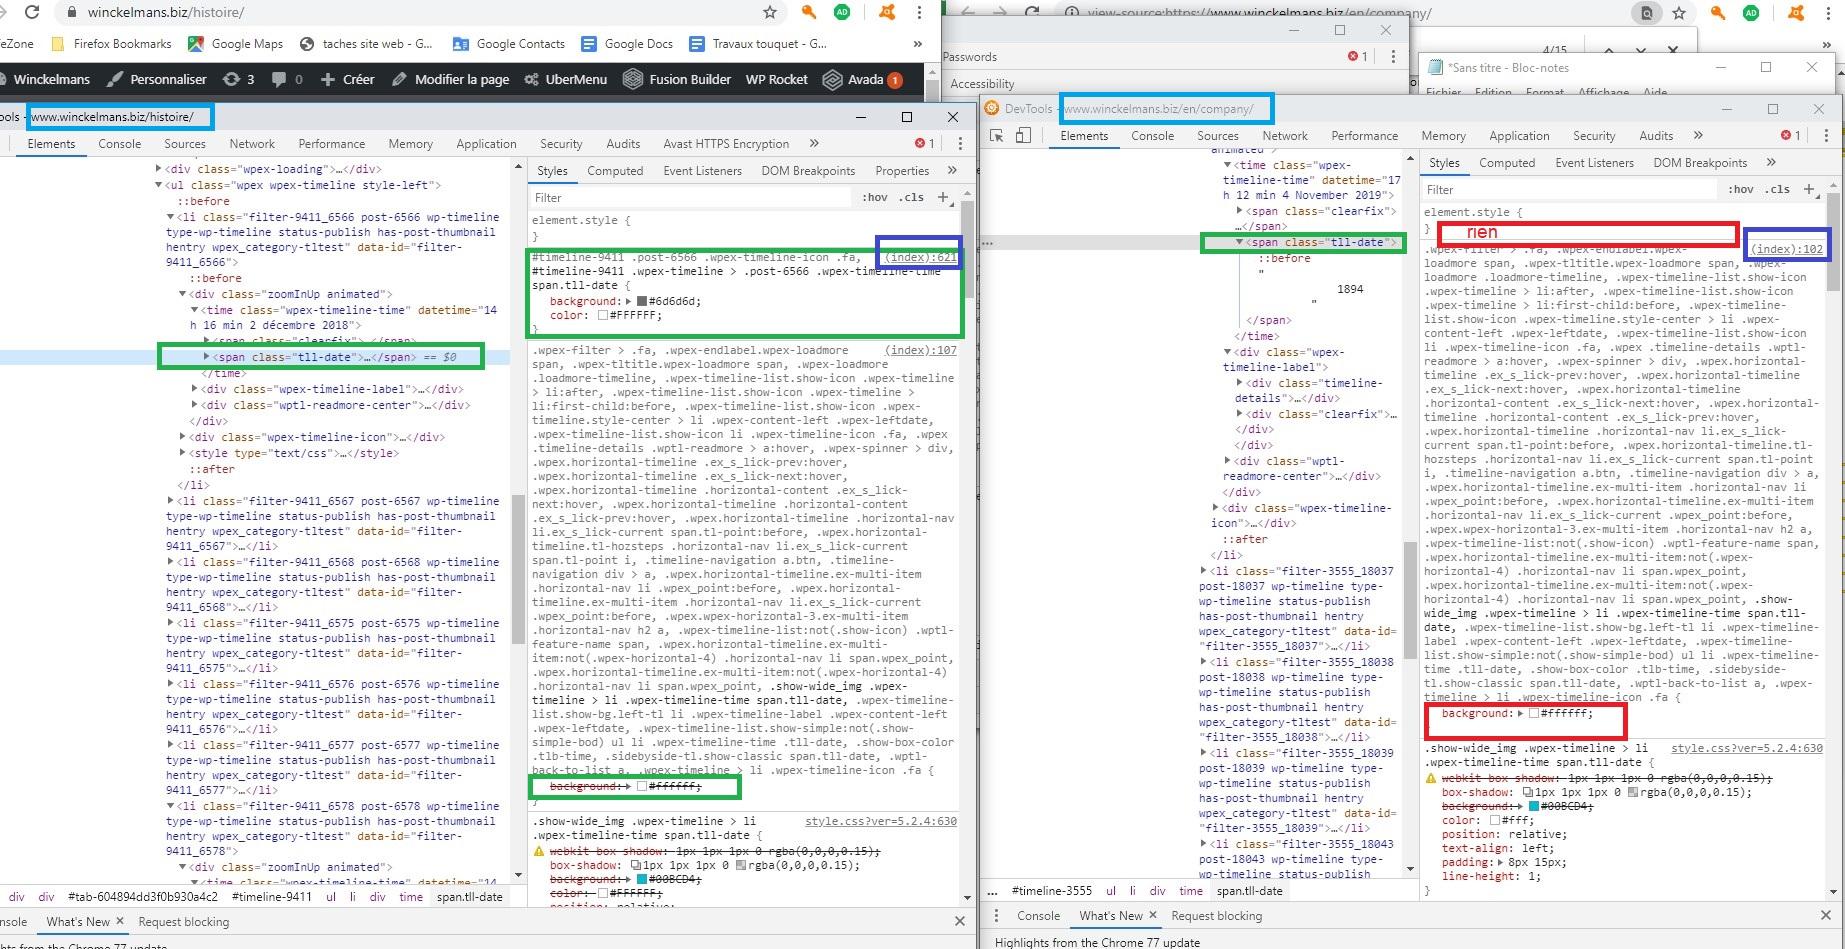 timeline-comparaison-inspection-FR-ANGL.jpg